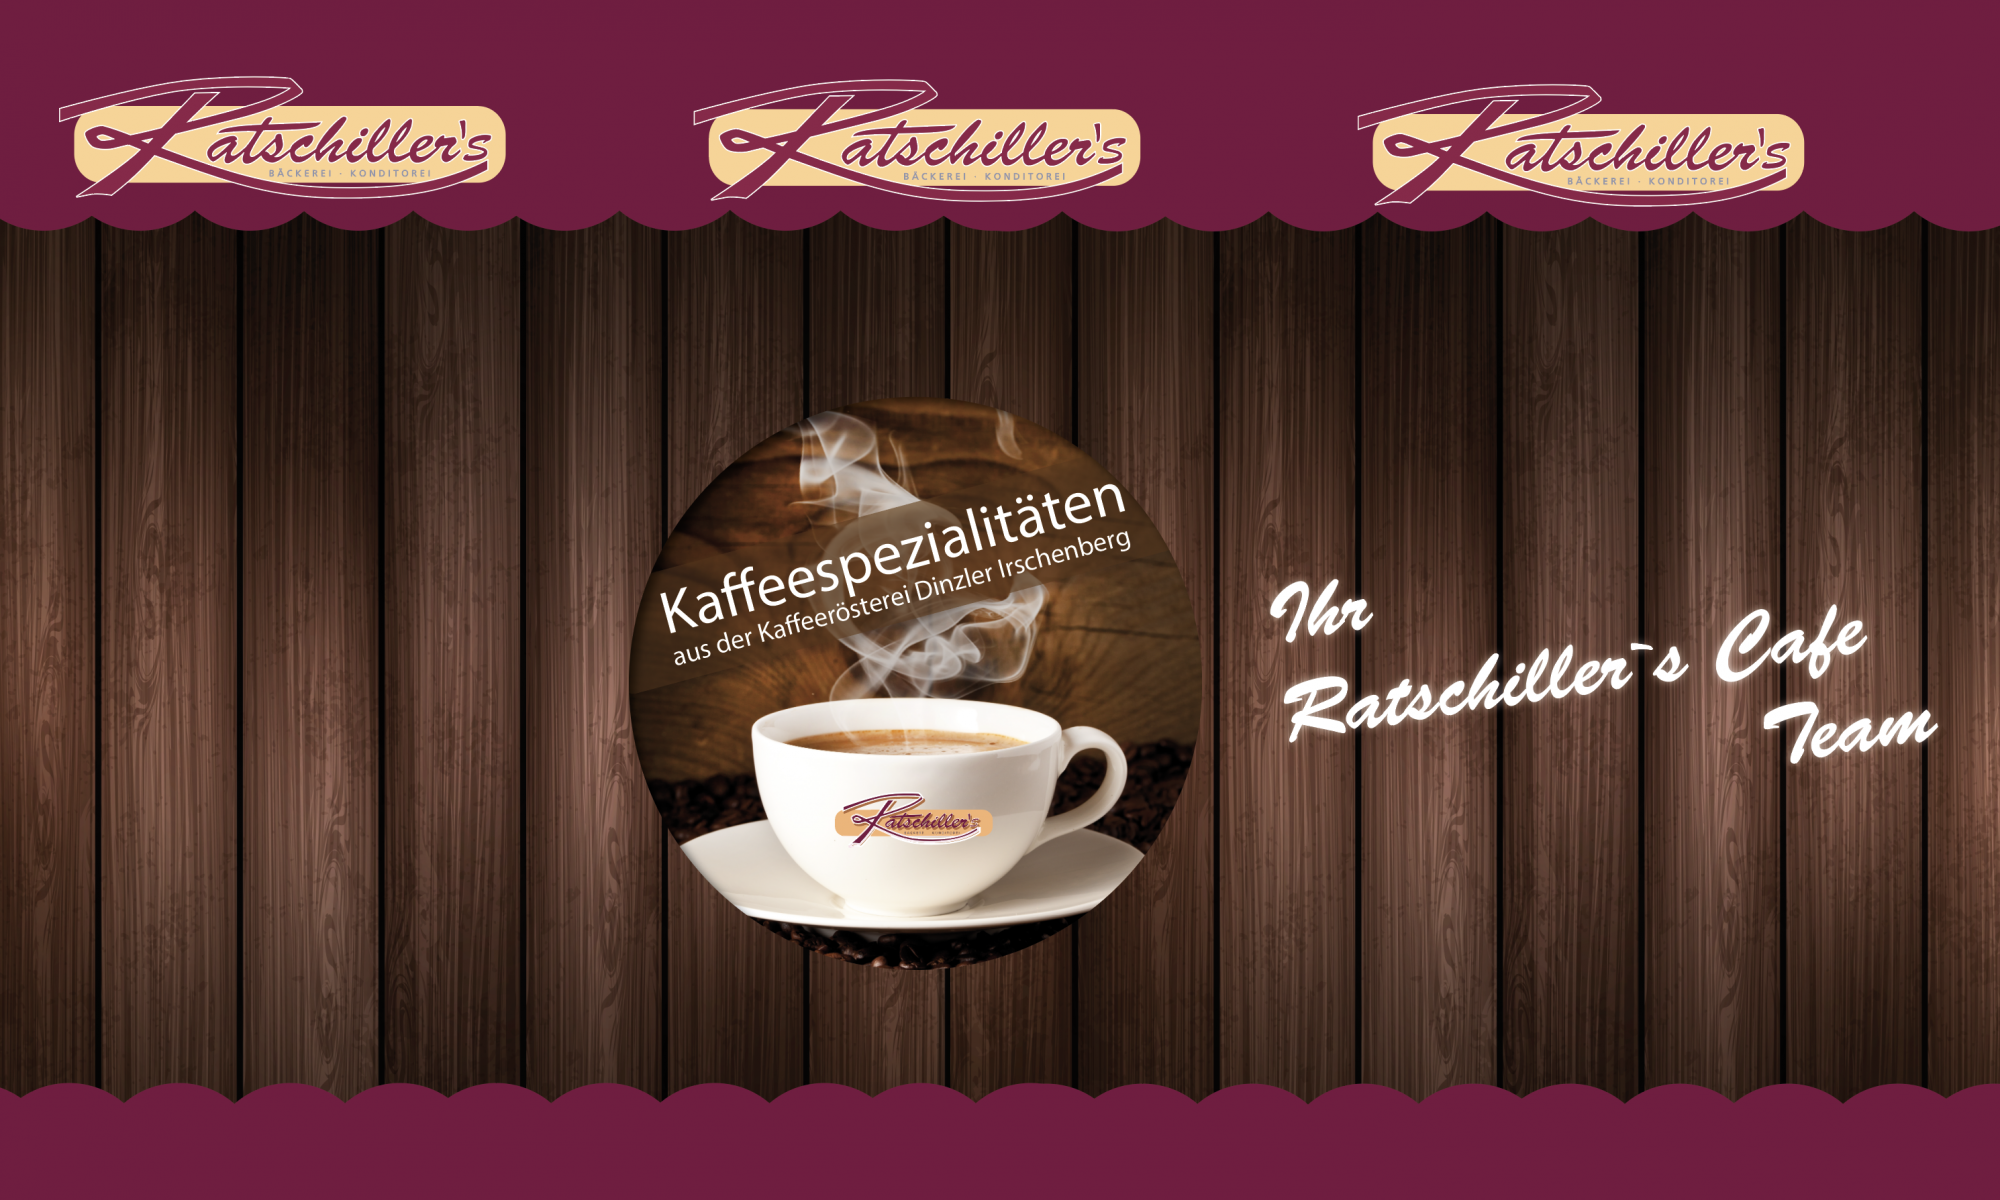 www.Ratschillers-Eching.de